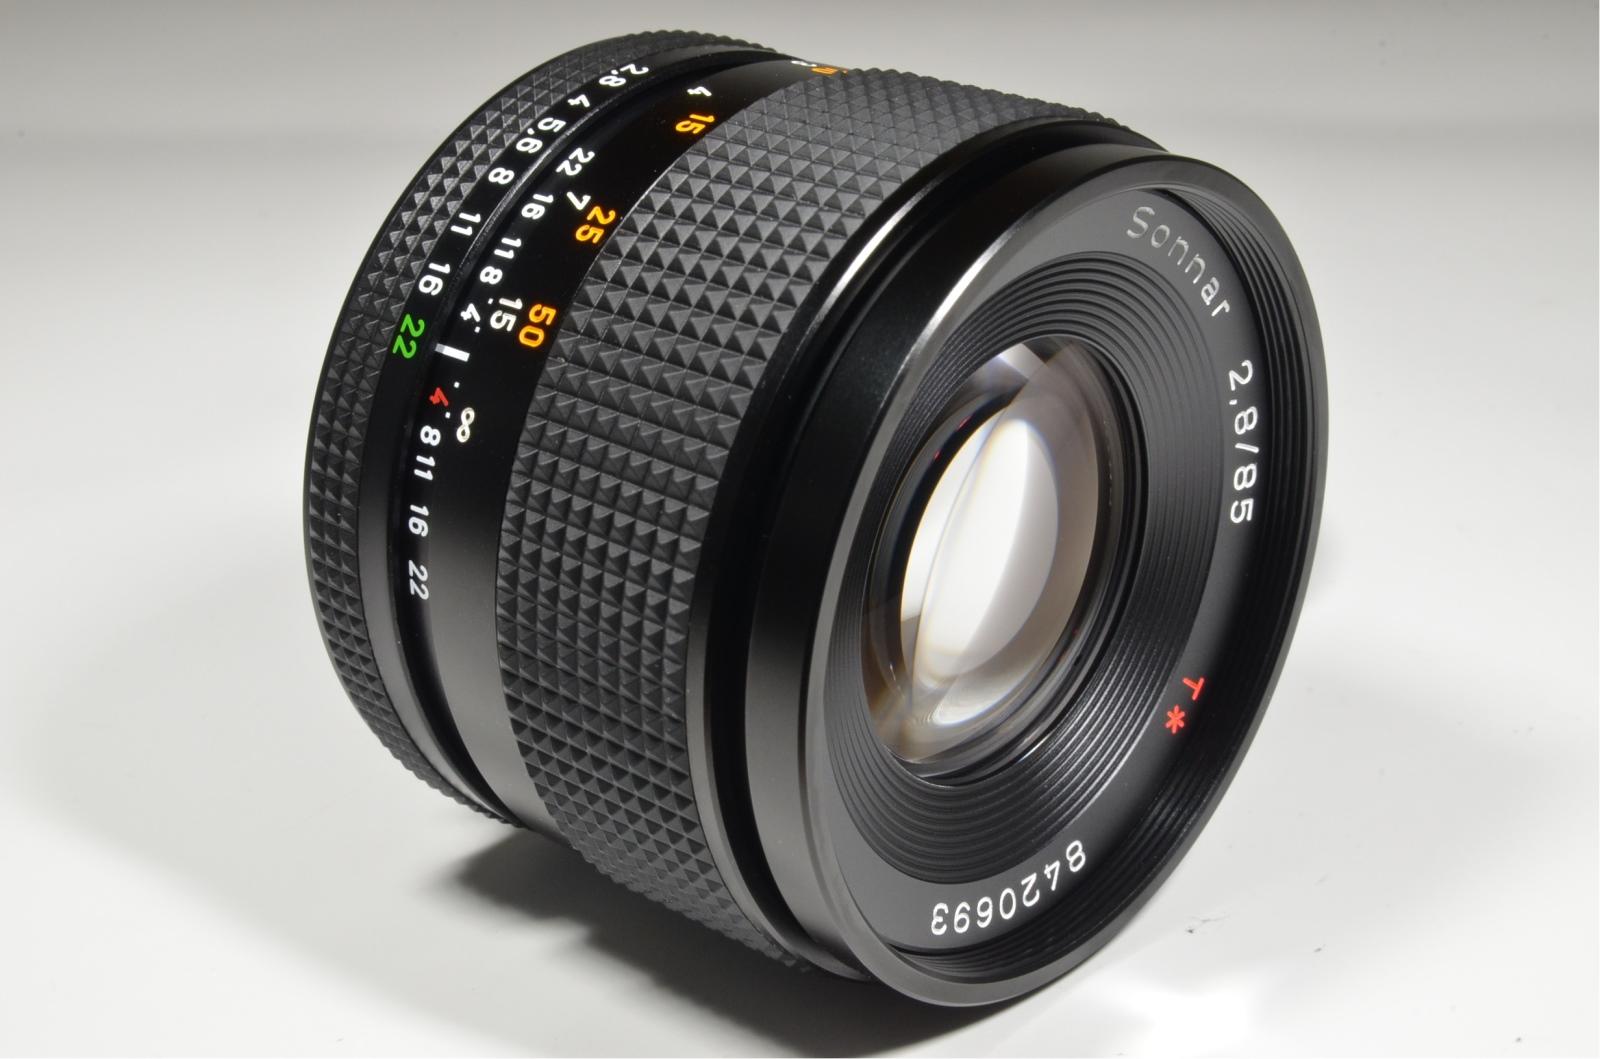 contax carl zeiss sonnar t* 85mm f2.8 mmg